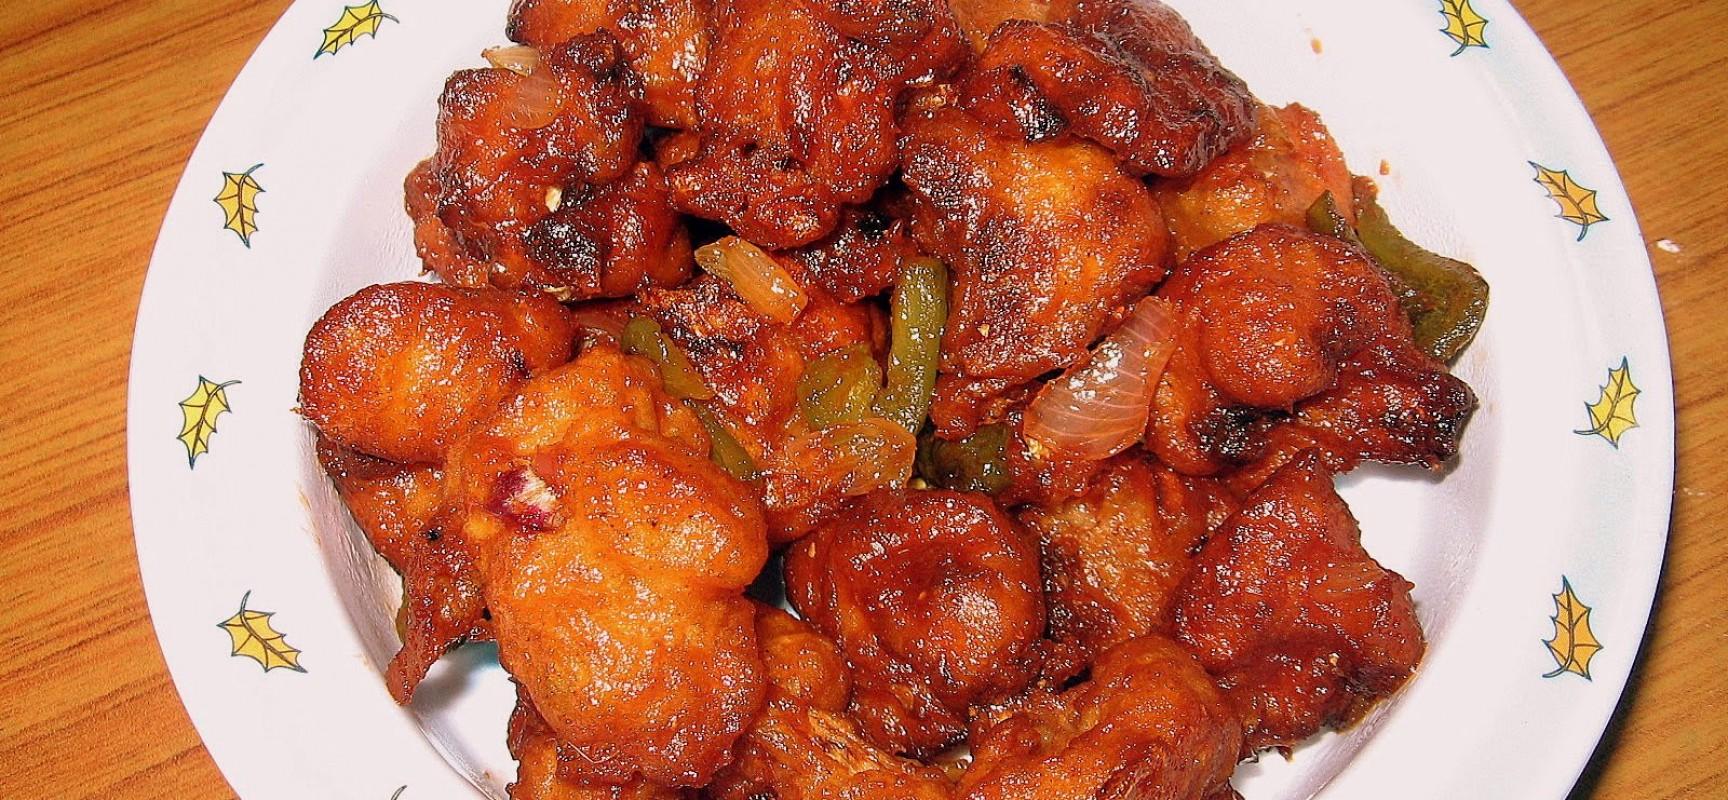 views june 15 2014 no comments food recipes lokesh naidu